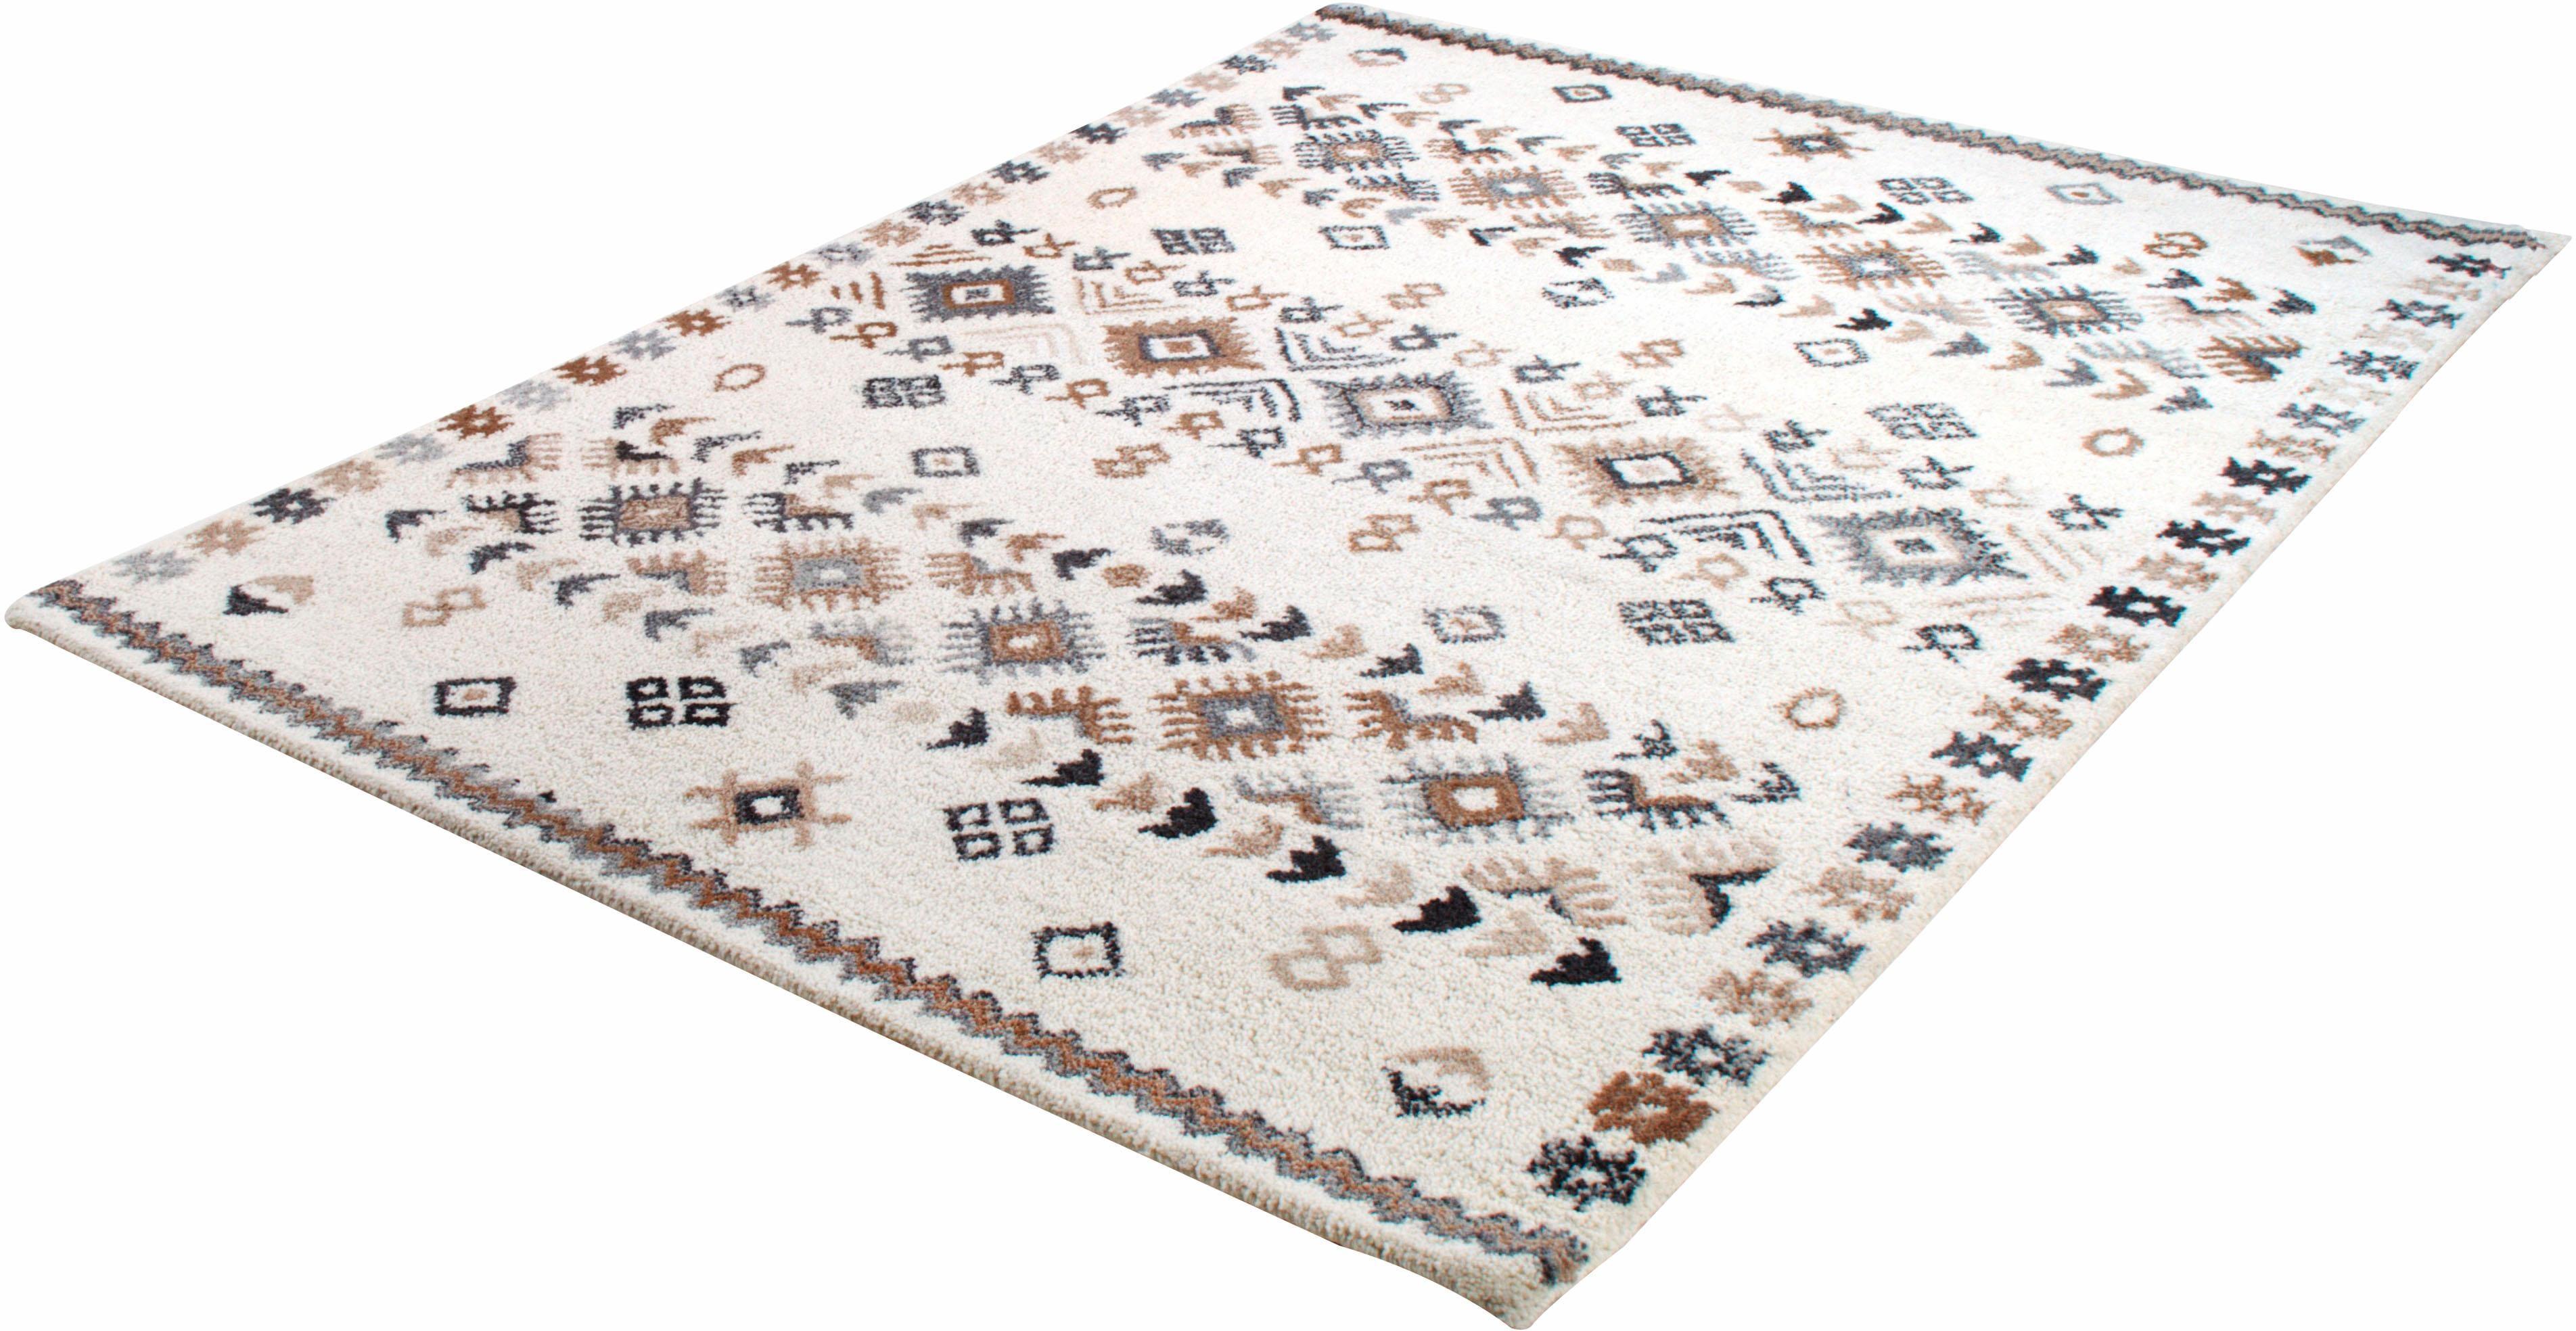 Wollteppich Royal Berber 113 THEKO rechteckig Höhe 18 mm handgetuftet